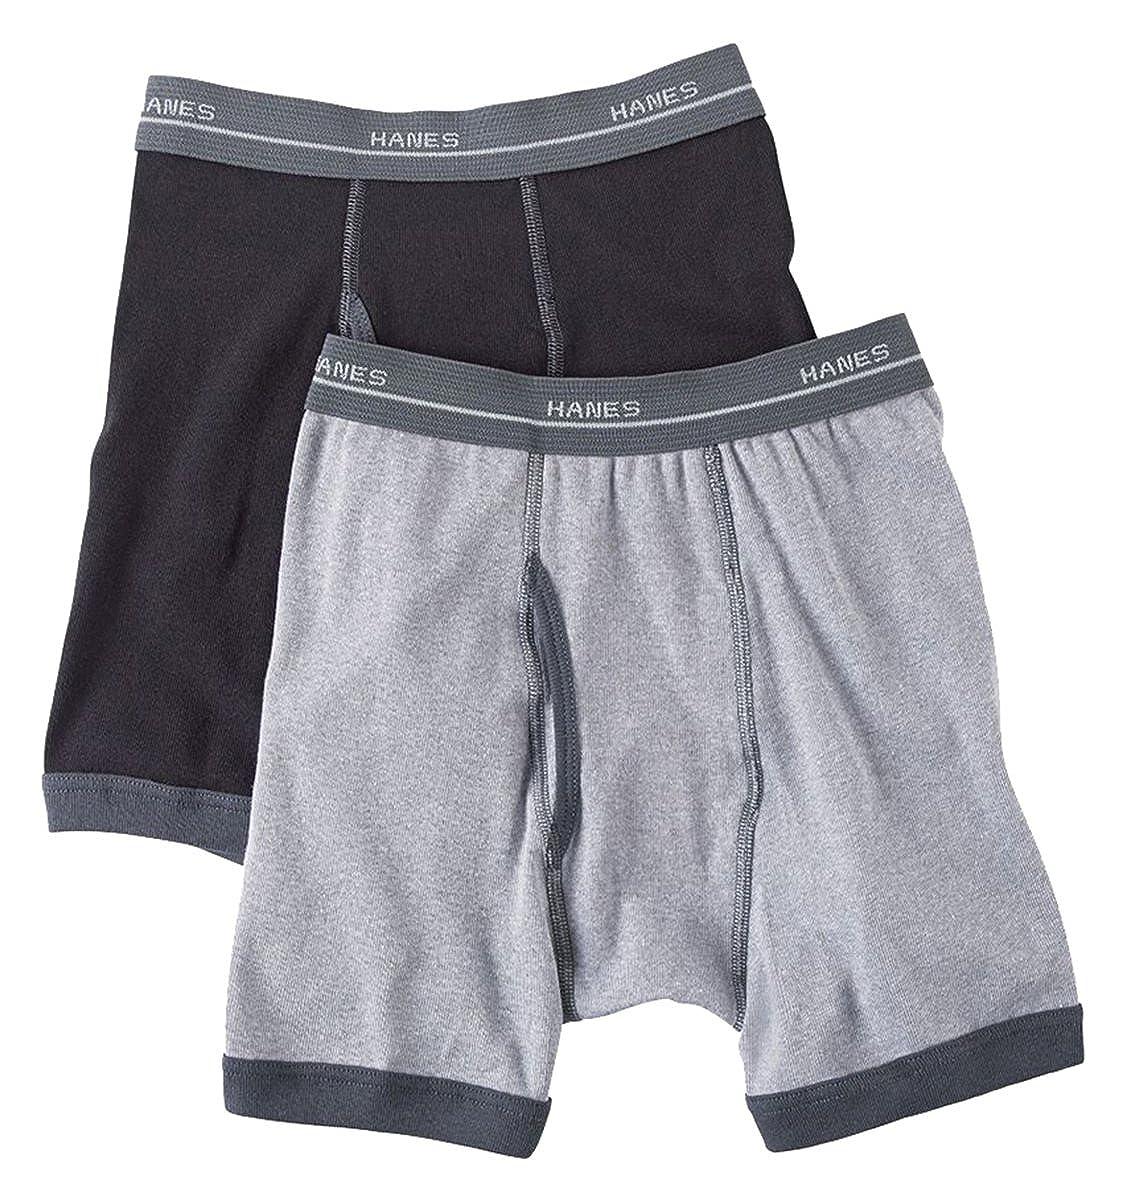 Hanes Boys Ringer Boxer Briefs 5-Pack/_Assorted/_Medium